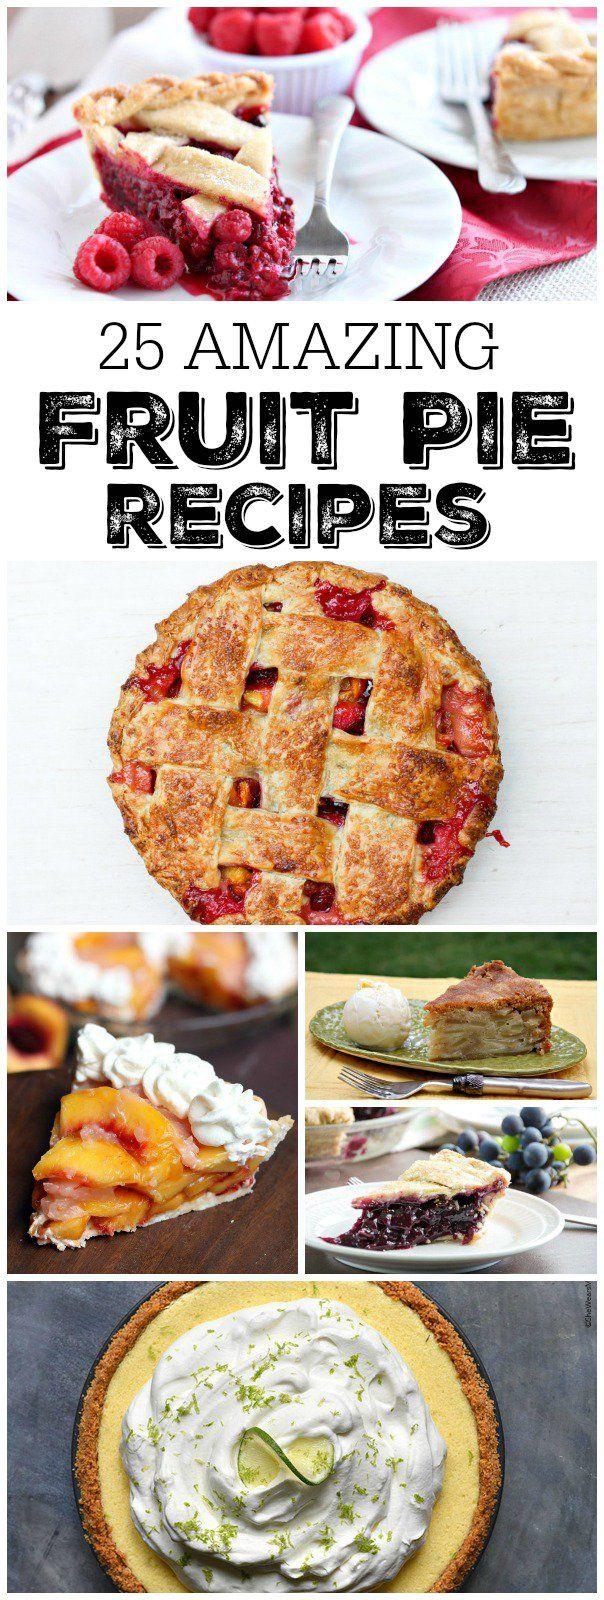 25 Amazing Fruit Pie Recipes: Raspberry Pie, Blackberry Pie, Lemon Sour Cream Pie, Watermelon Chiffon Pie, Rustic Plum Biscuit Pie, Concord Grape Pie, Fresh Huckleberry Pie and MORE!